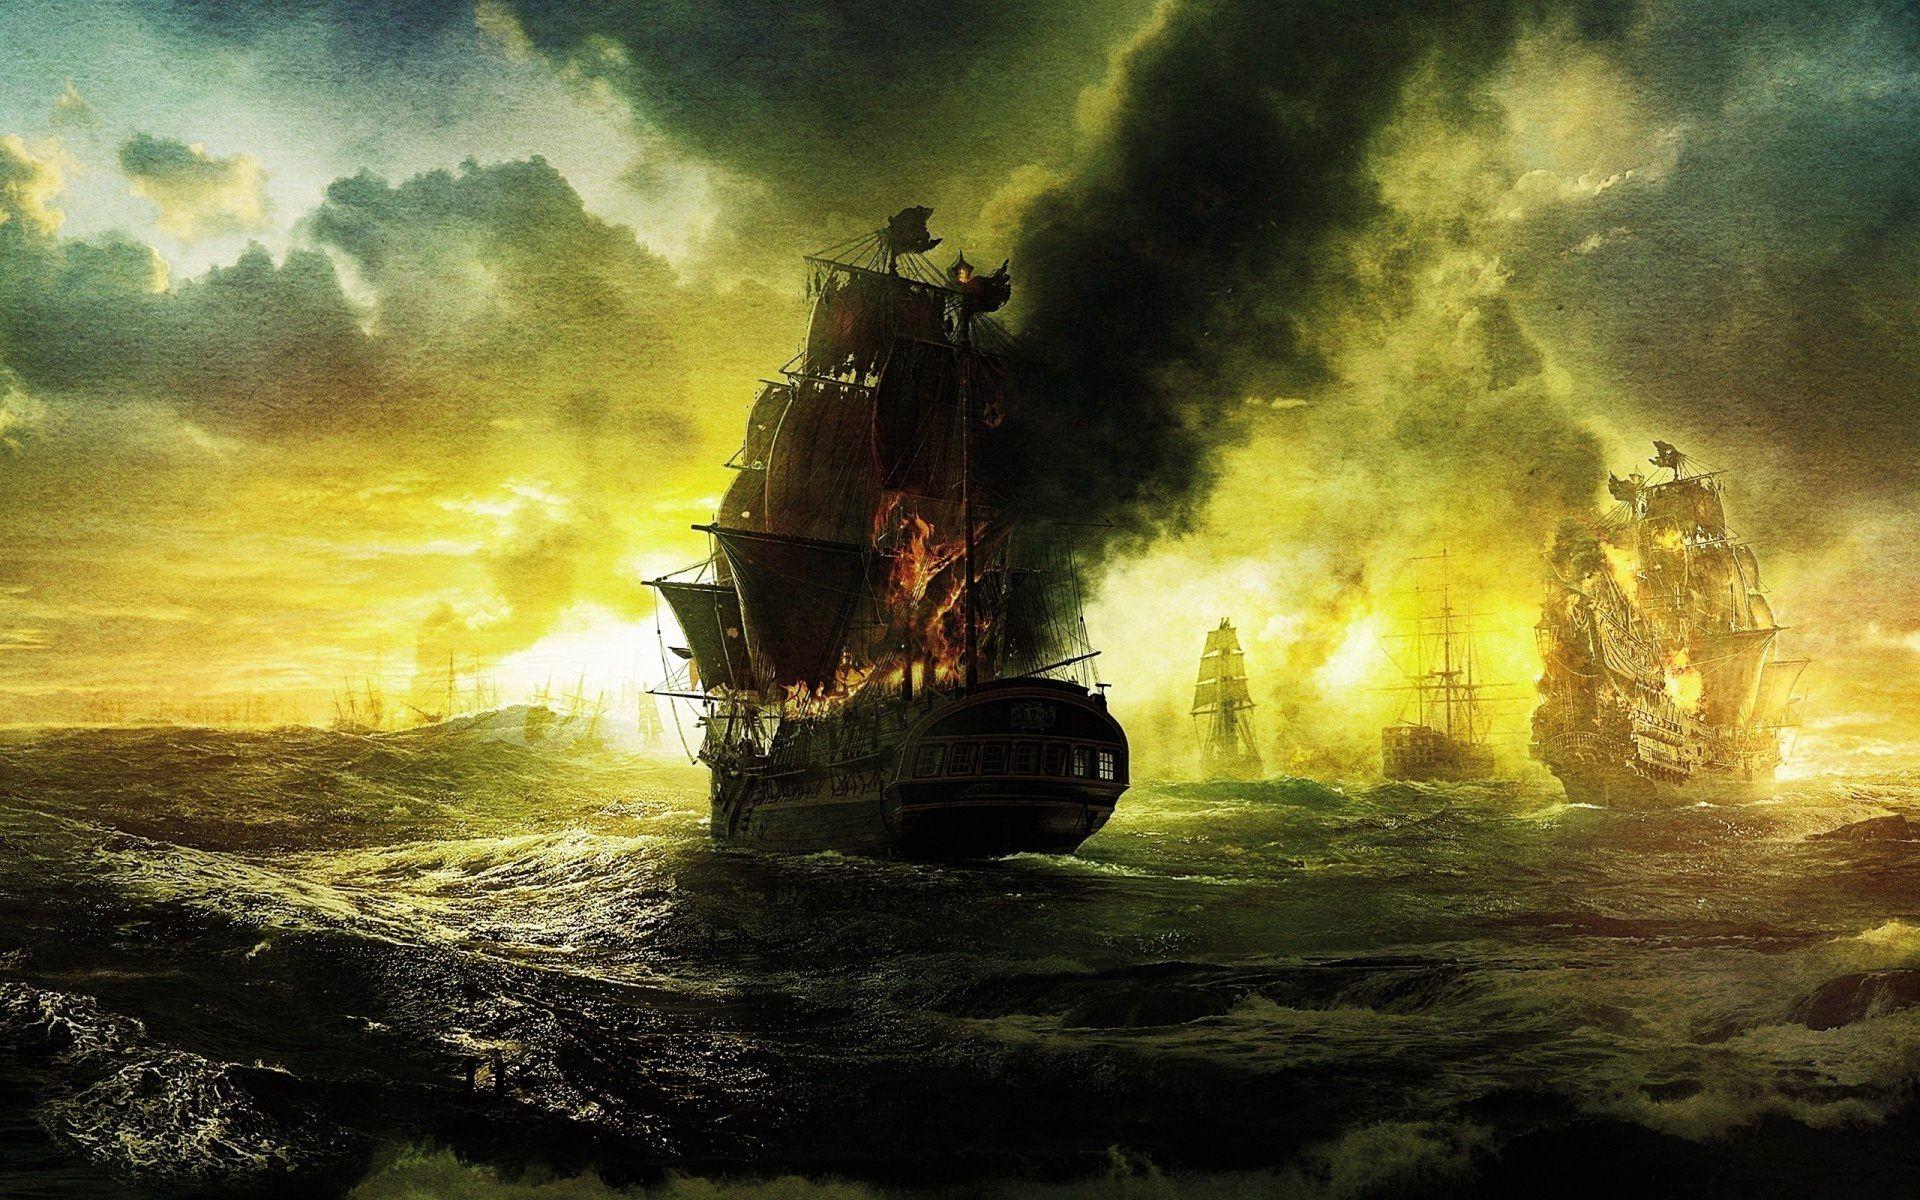 Desktop pirates of the caribbean ship images download